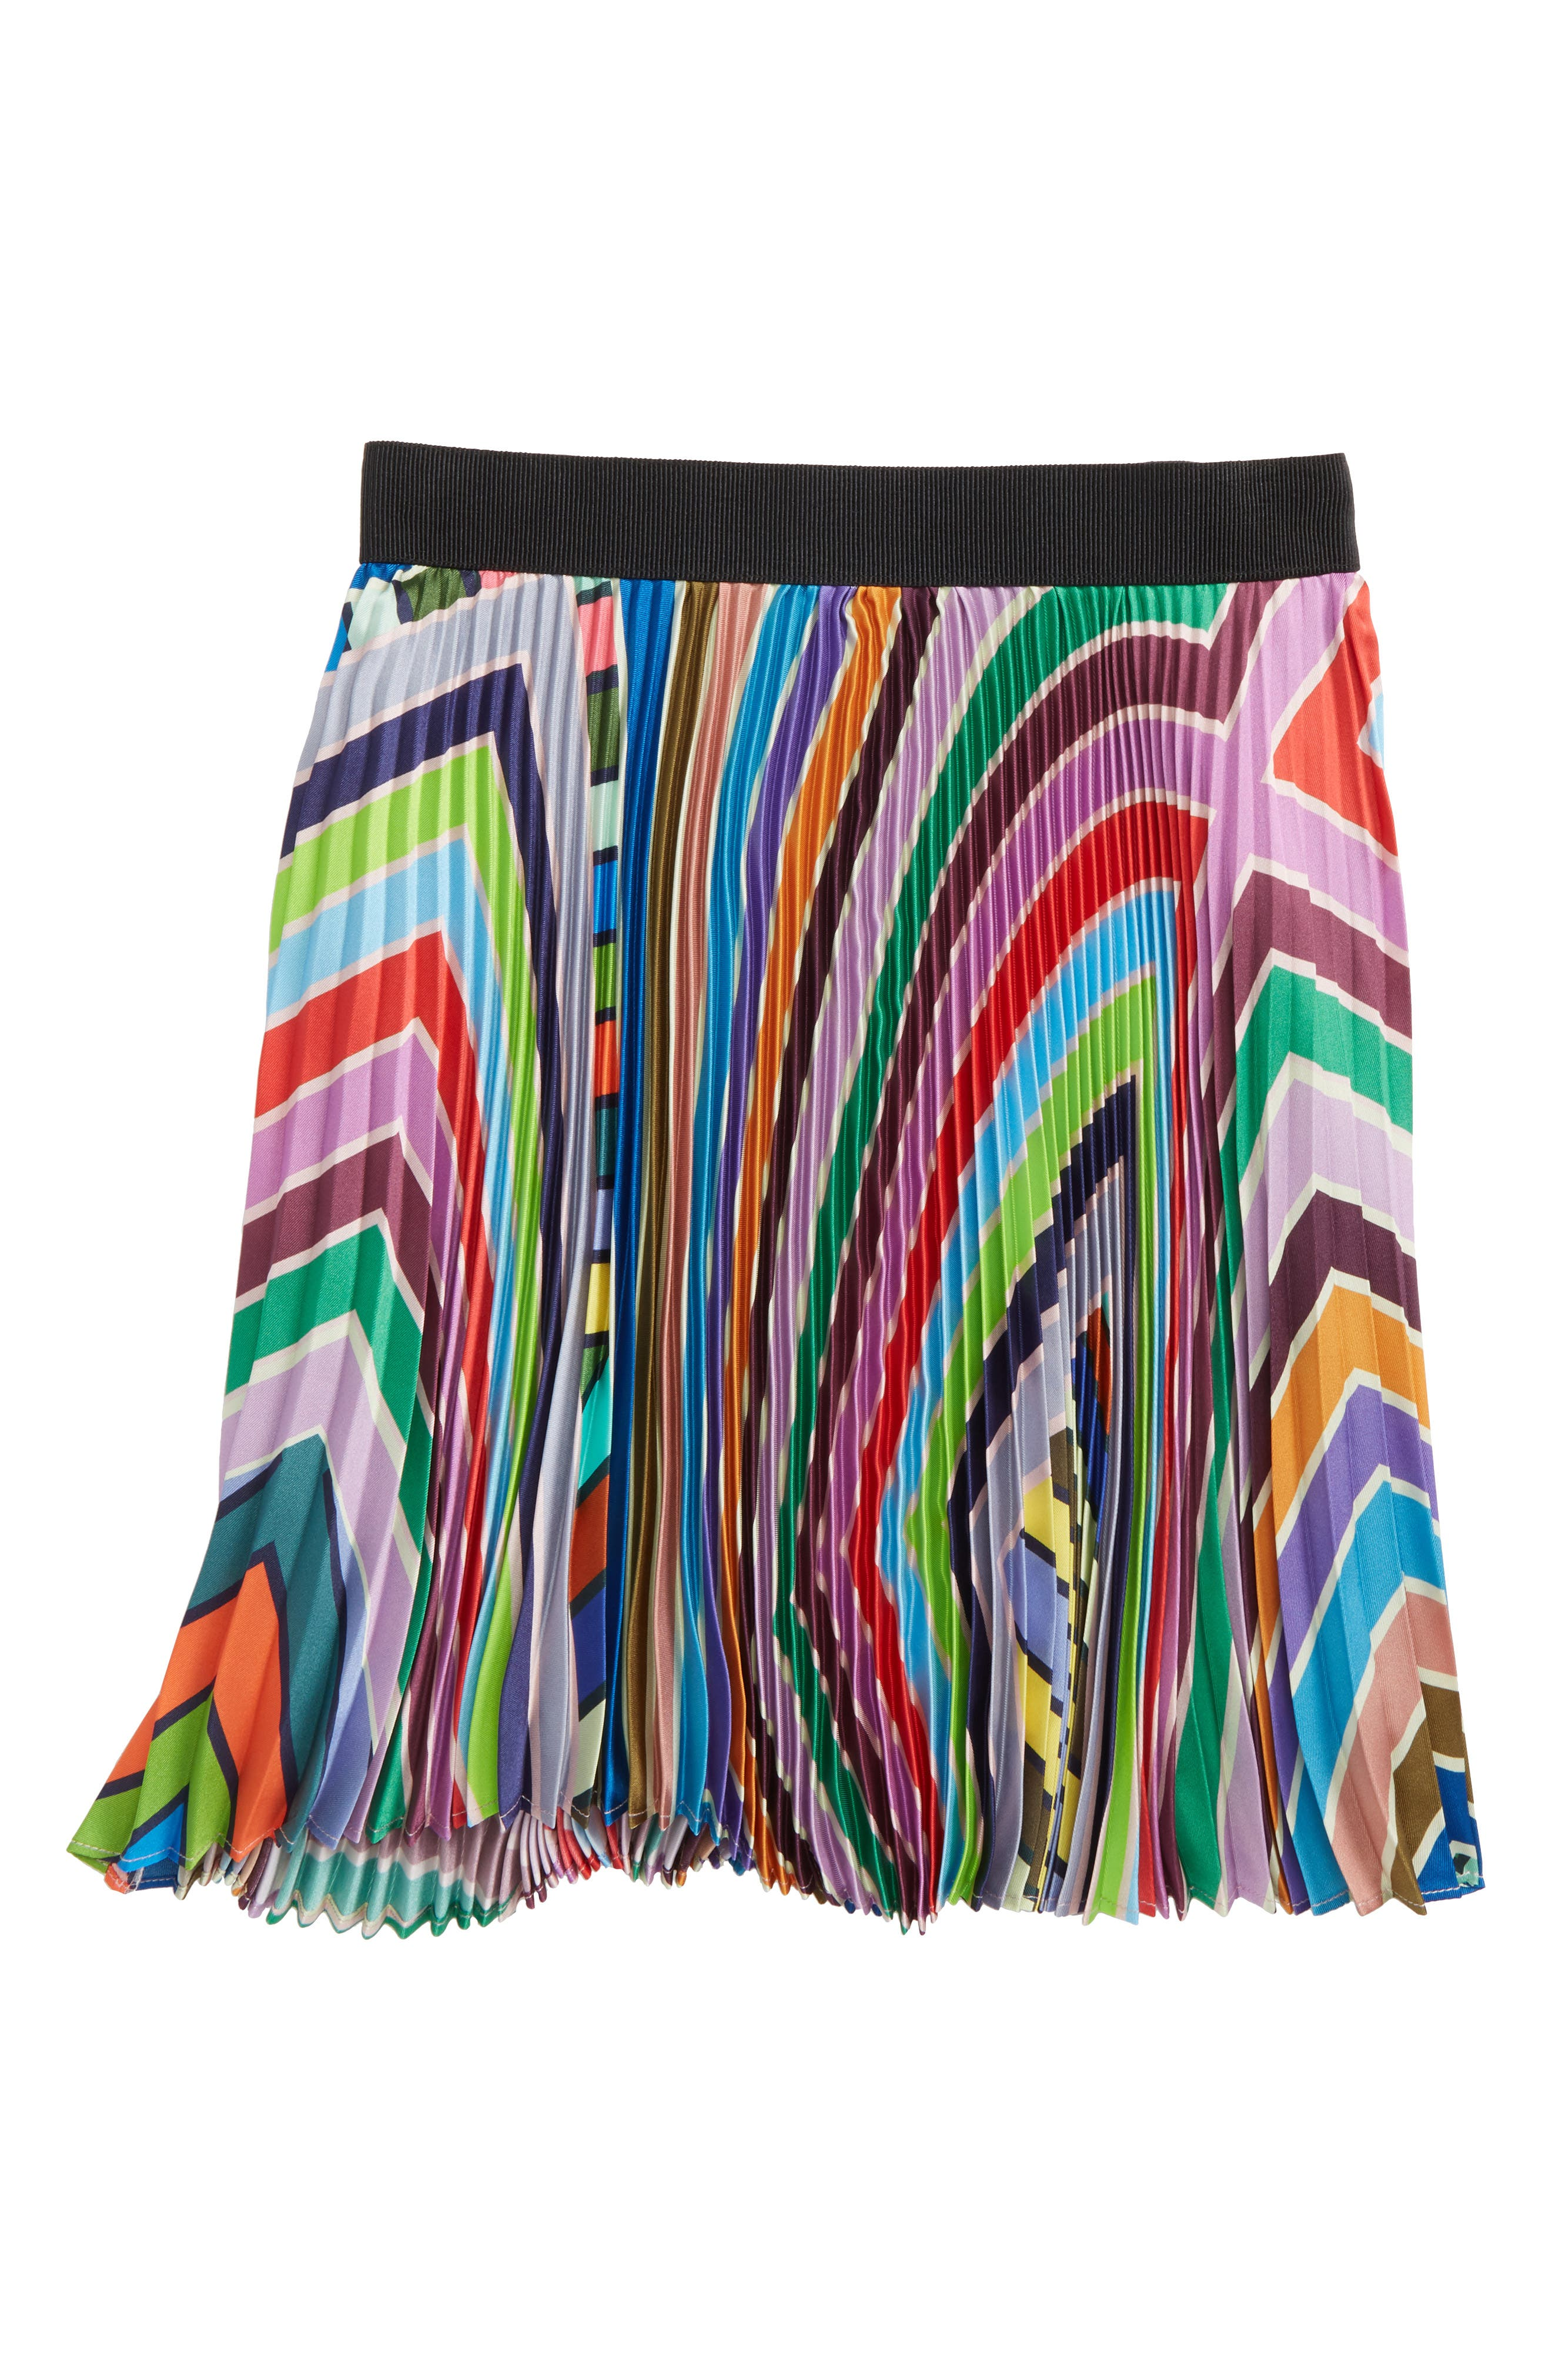 Main Image - Milly Minis Pleated Skirt (Big Girls)